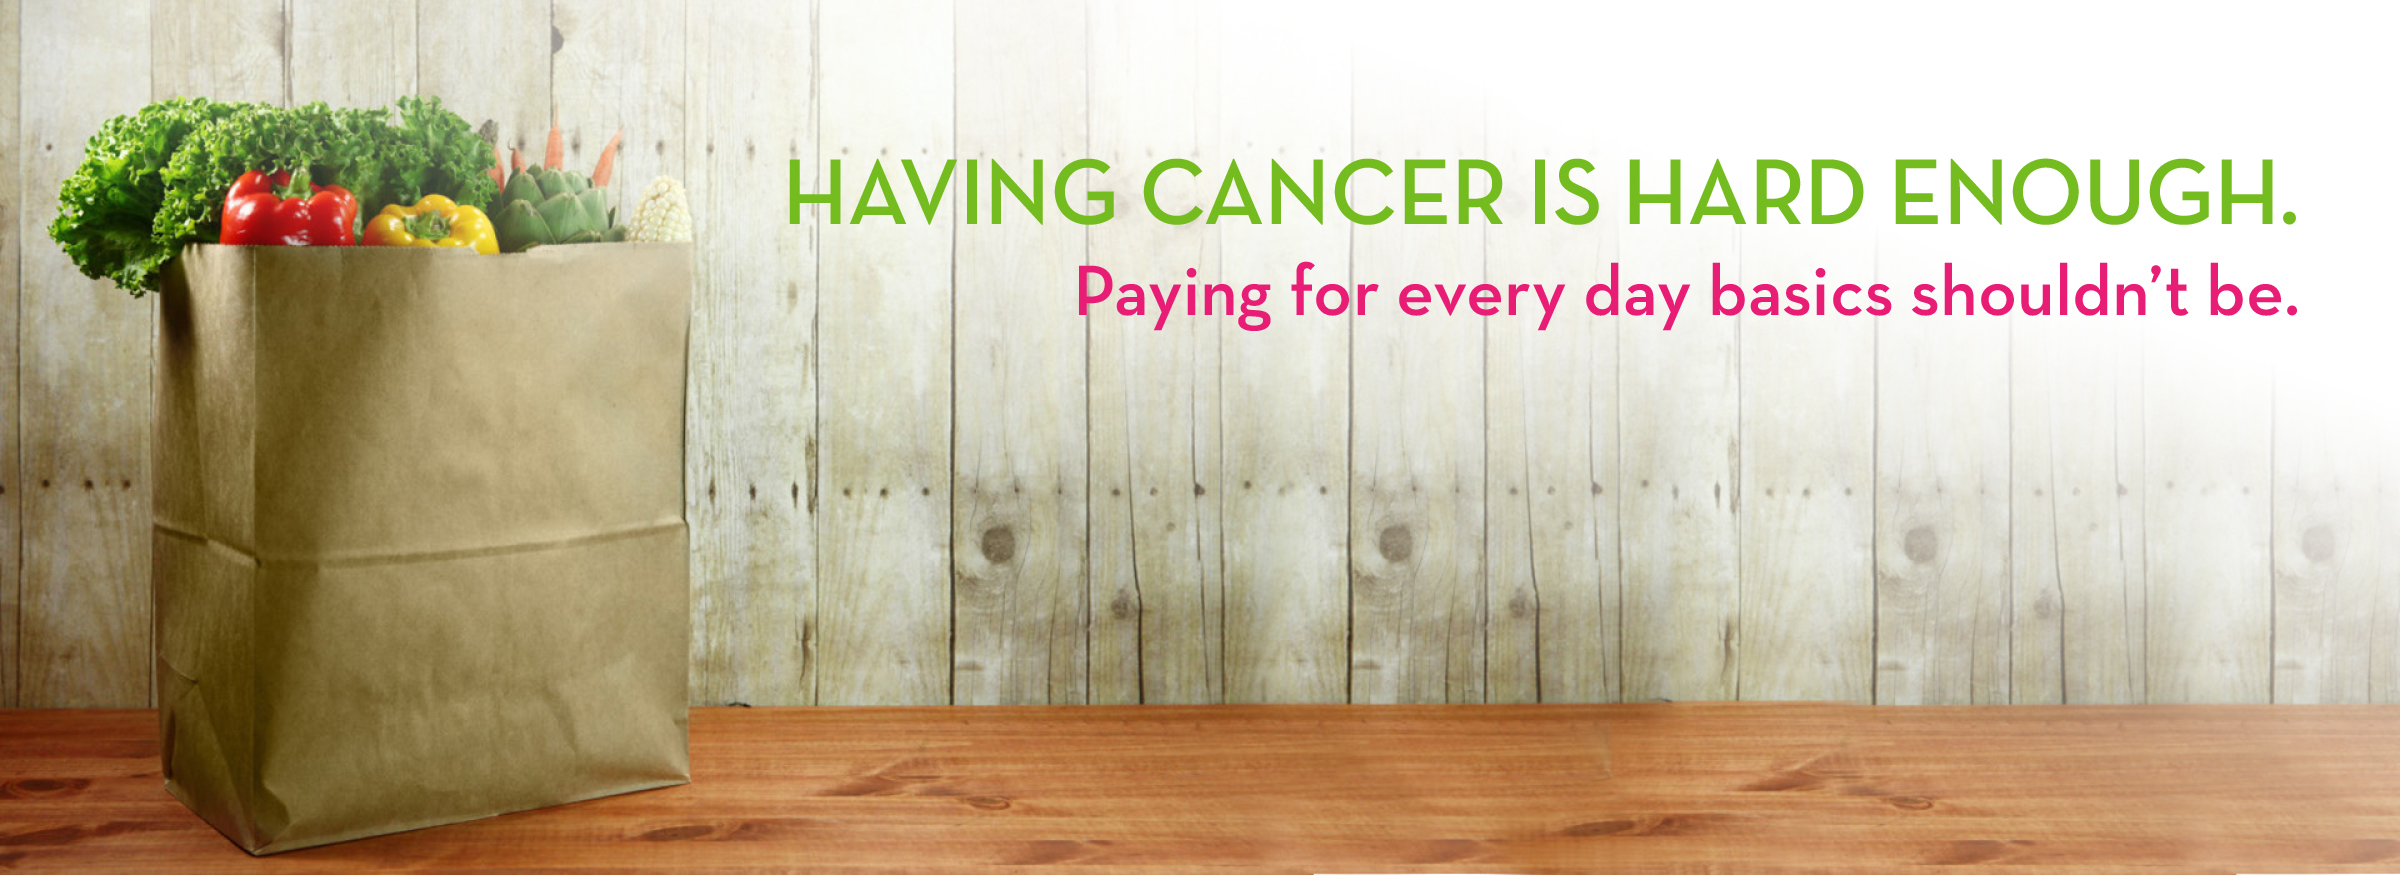 Having Cancer is Hard Enough